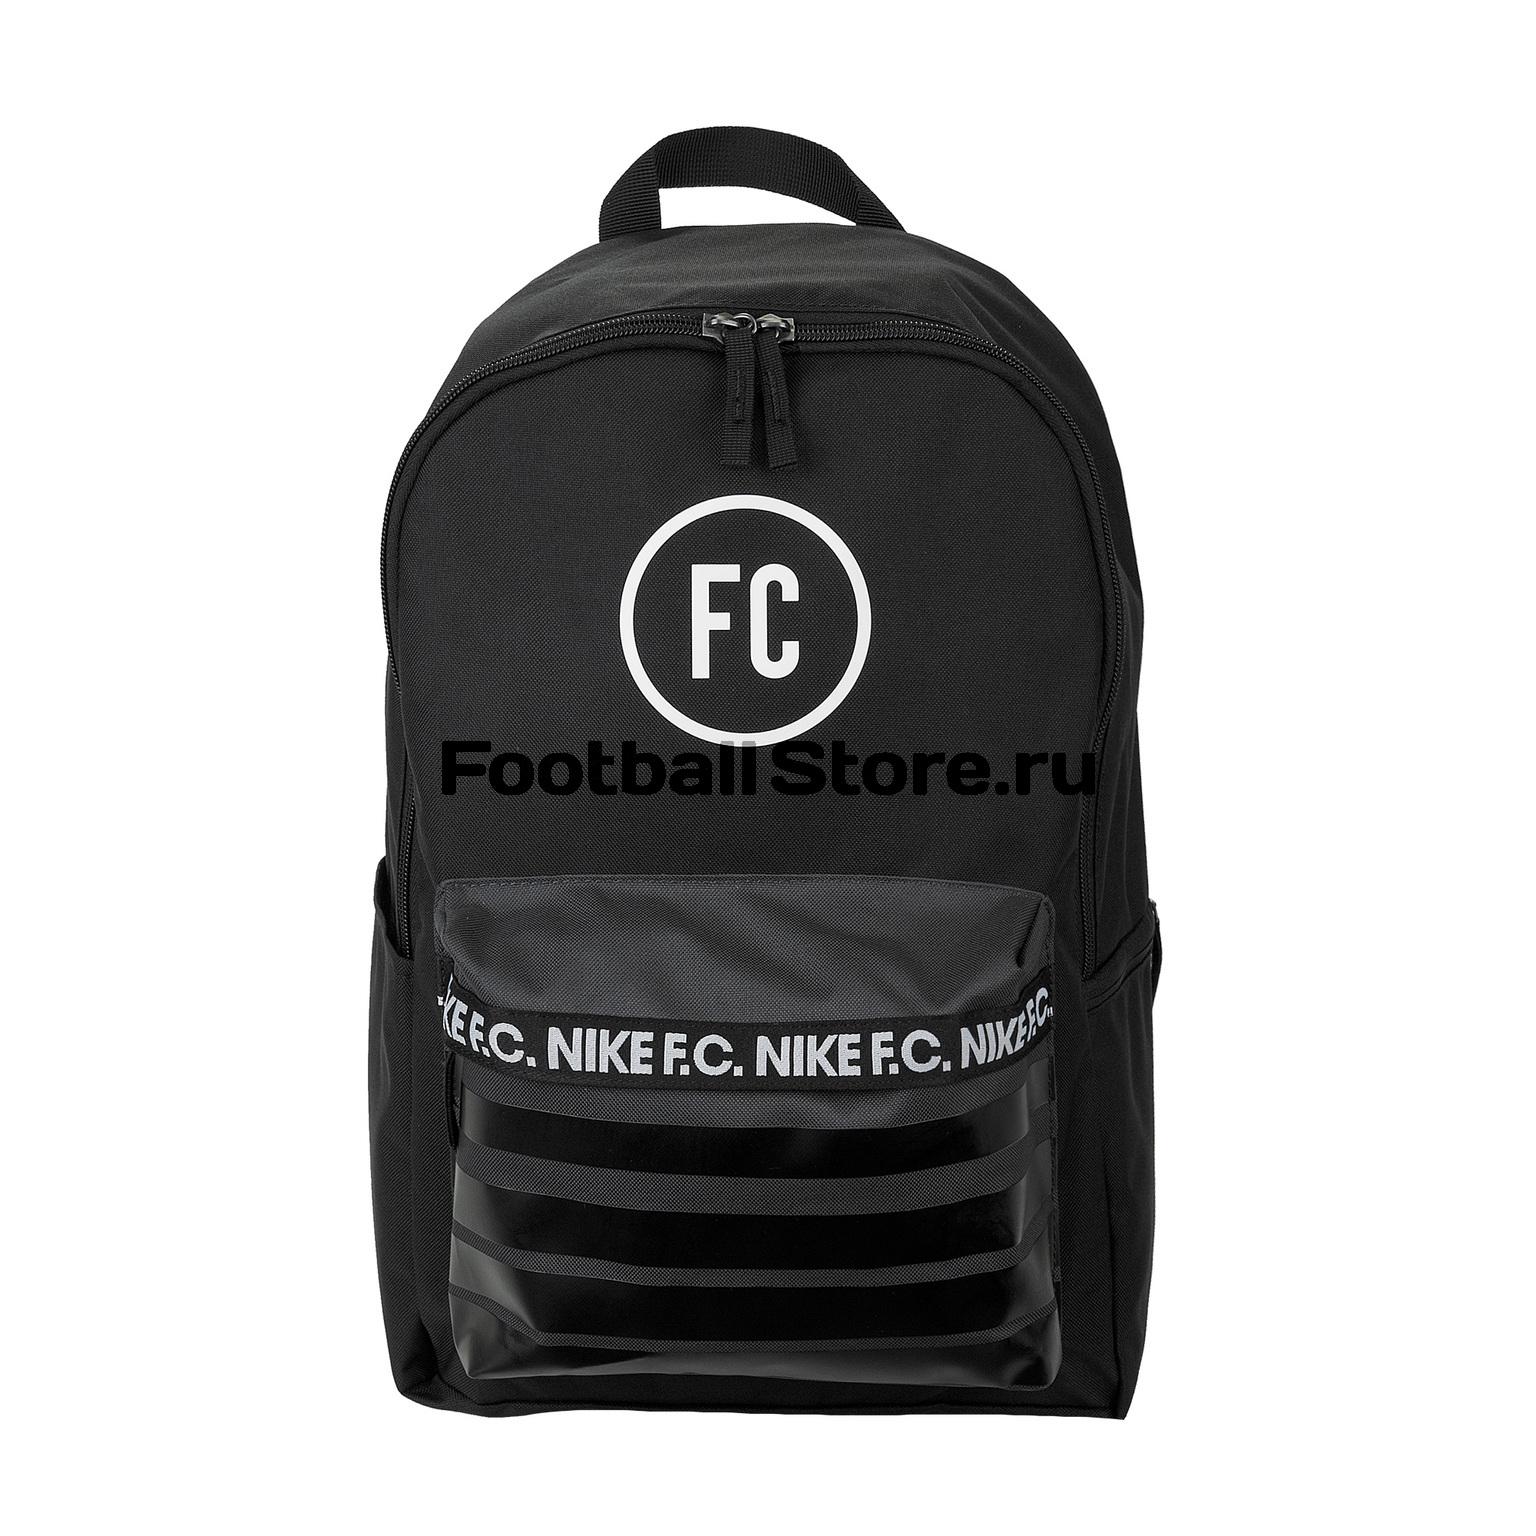 цены Рюкзак Nike F.C. BA6109-011